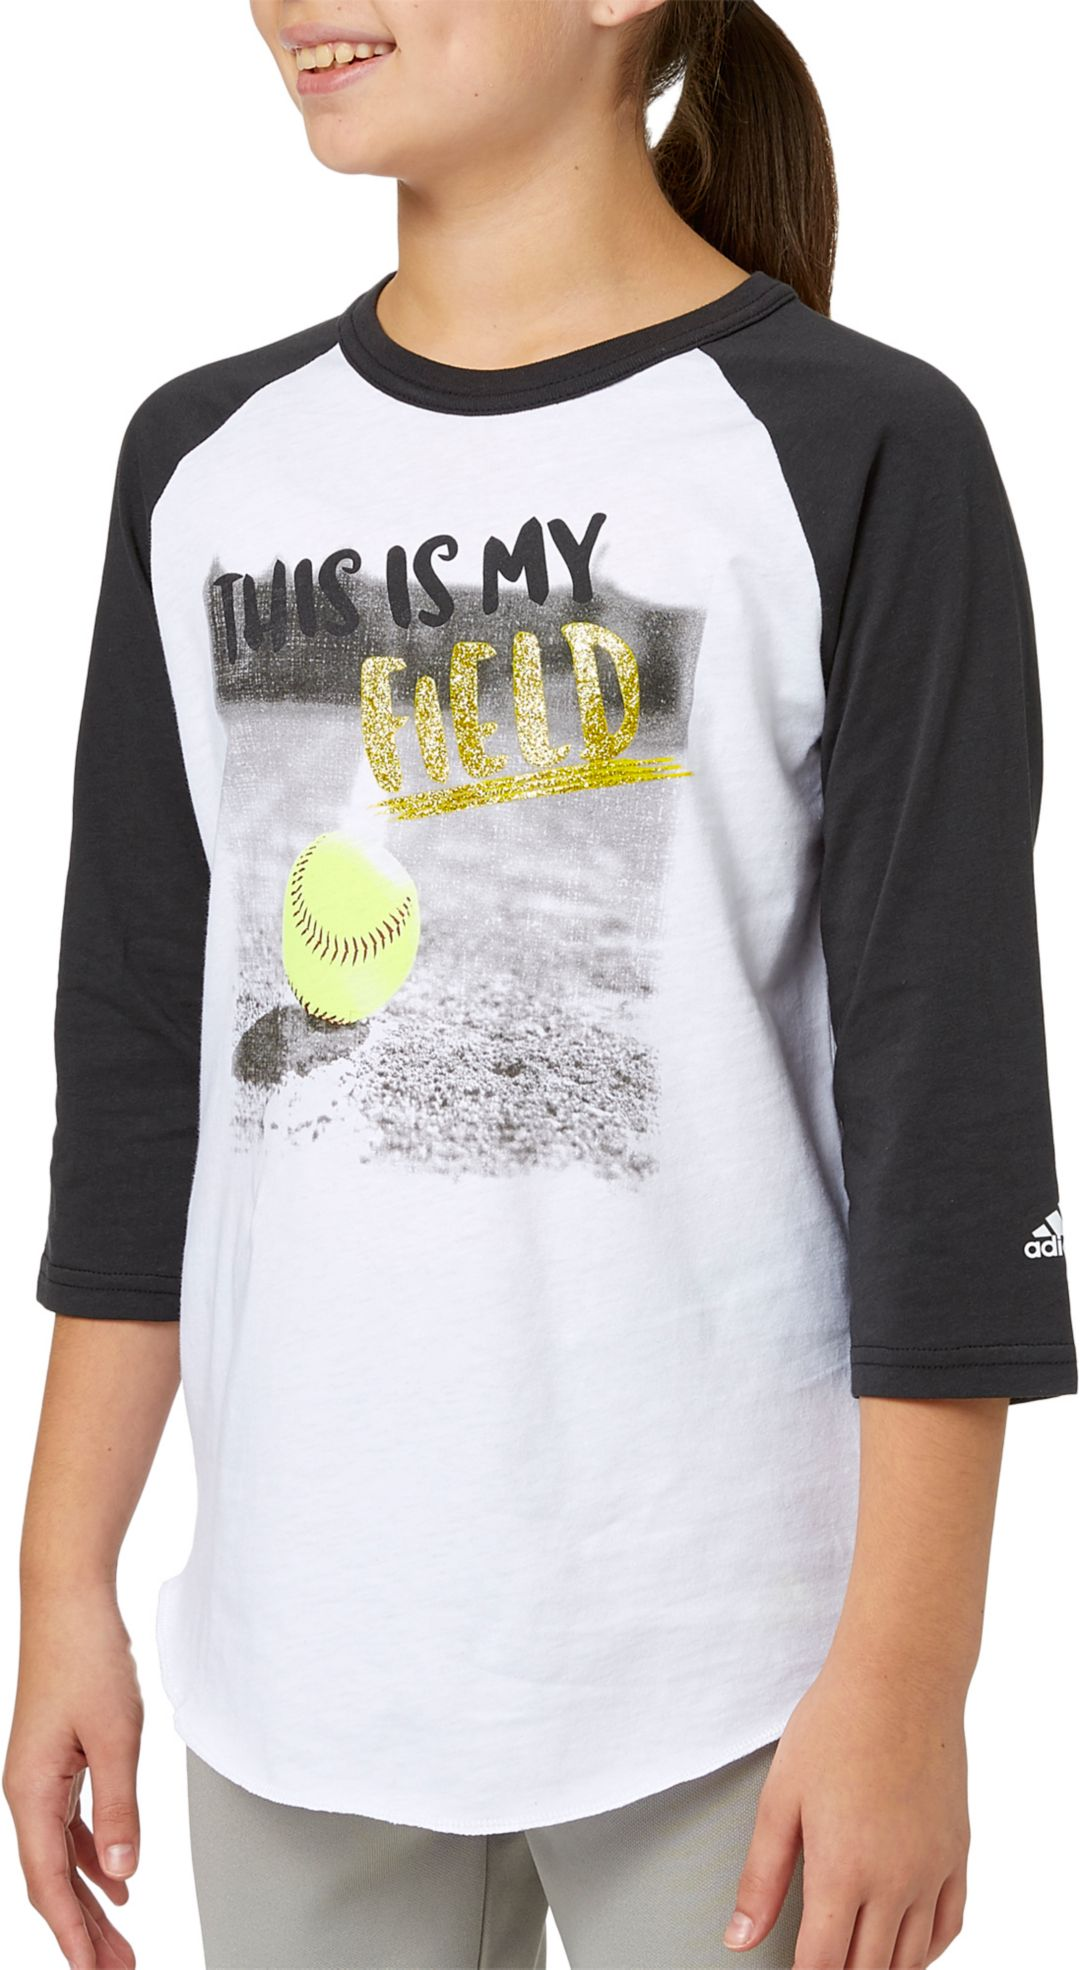 fa4c6c14a939 adidas Girls' My Field ¾ Sleeve Softball Shirt   DICK'S Sporting Goods